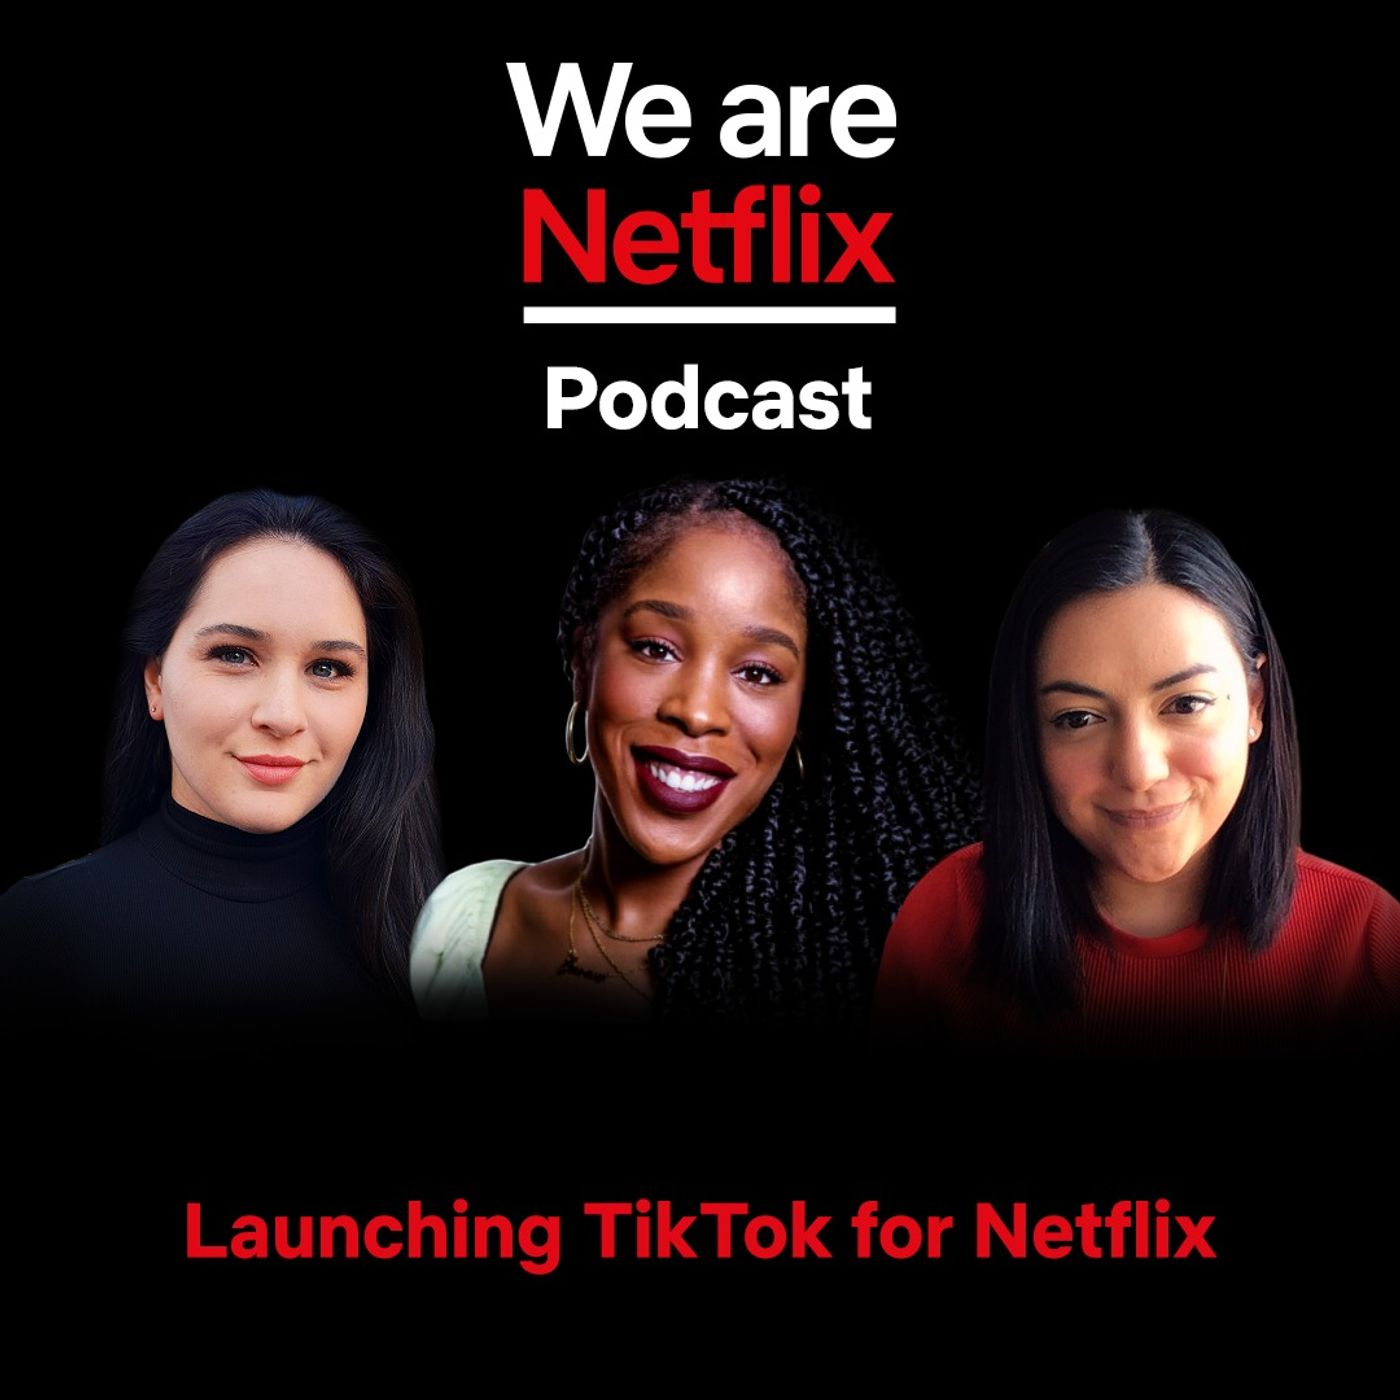 Launching TikTok for Netflix